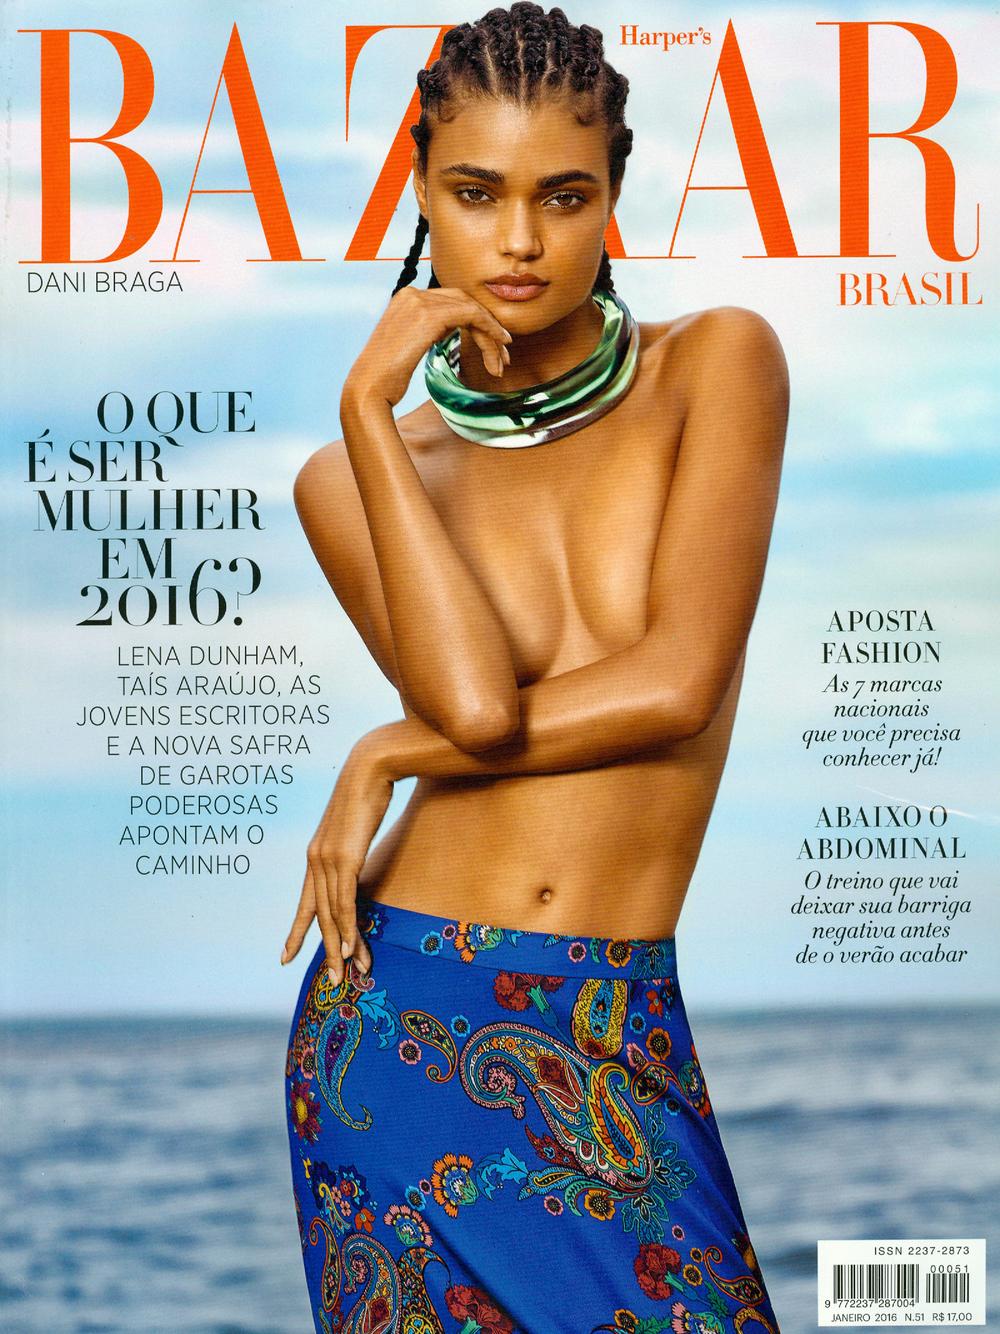 Daniela Braga - para rev. Harper's Bazaar- por Henrique Schiefferdecker  (157) .jpg